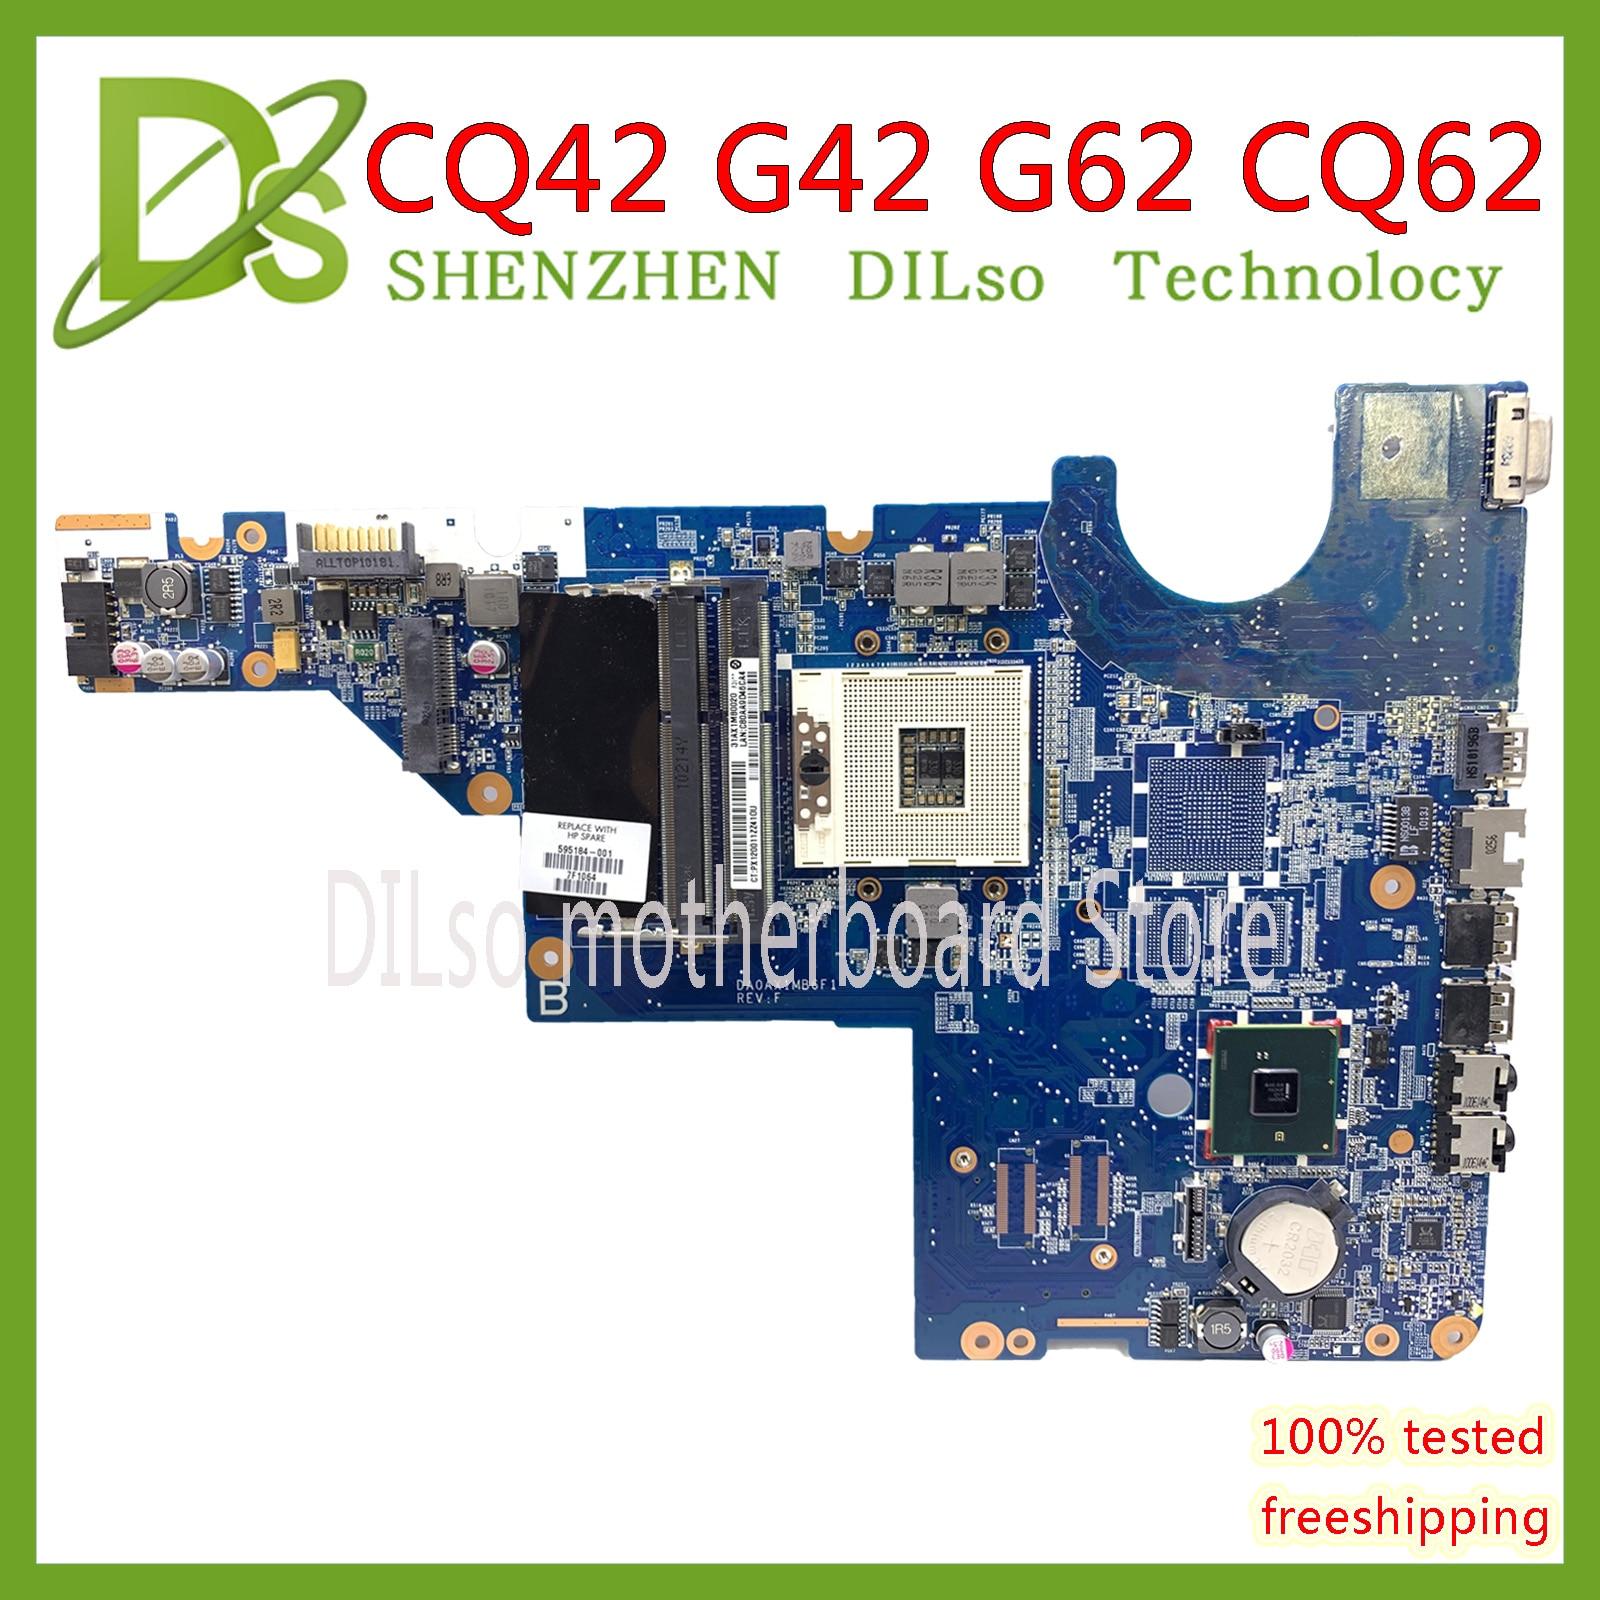 KEFU CQ62 para tarjeta madre para HP CQ42 G42 G62 CQ62 placa base de computadora portátil DAOAX1MB6F0 DA0AX1MB6H0 100% original